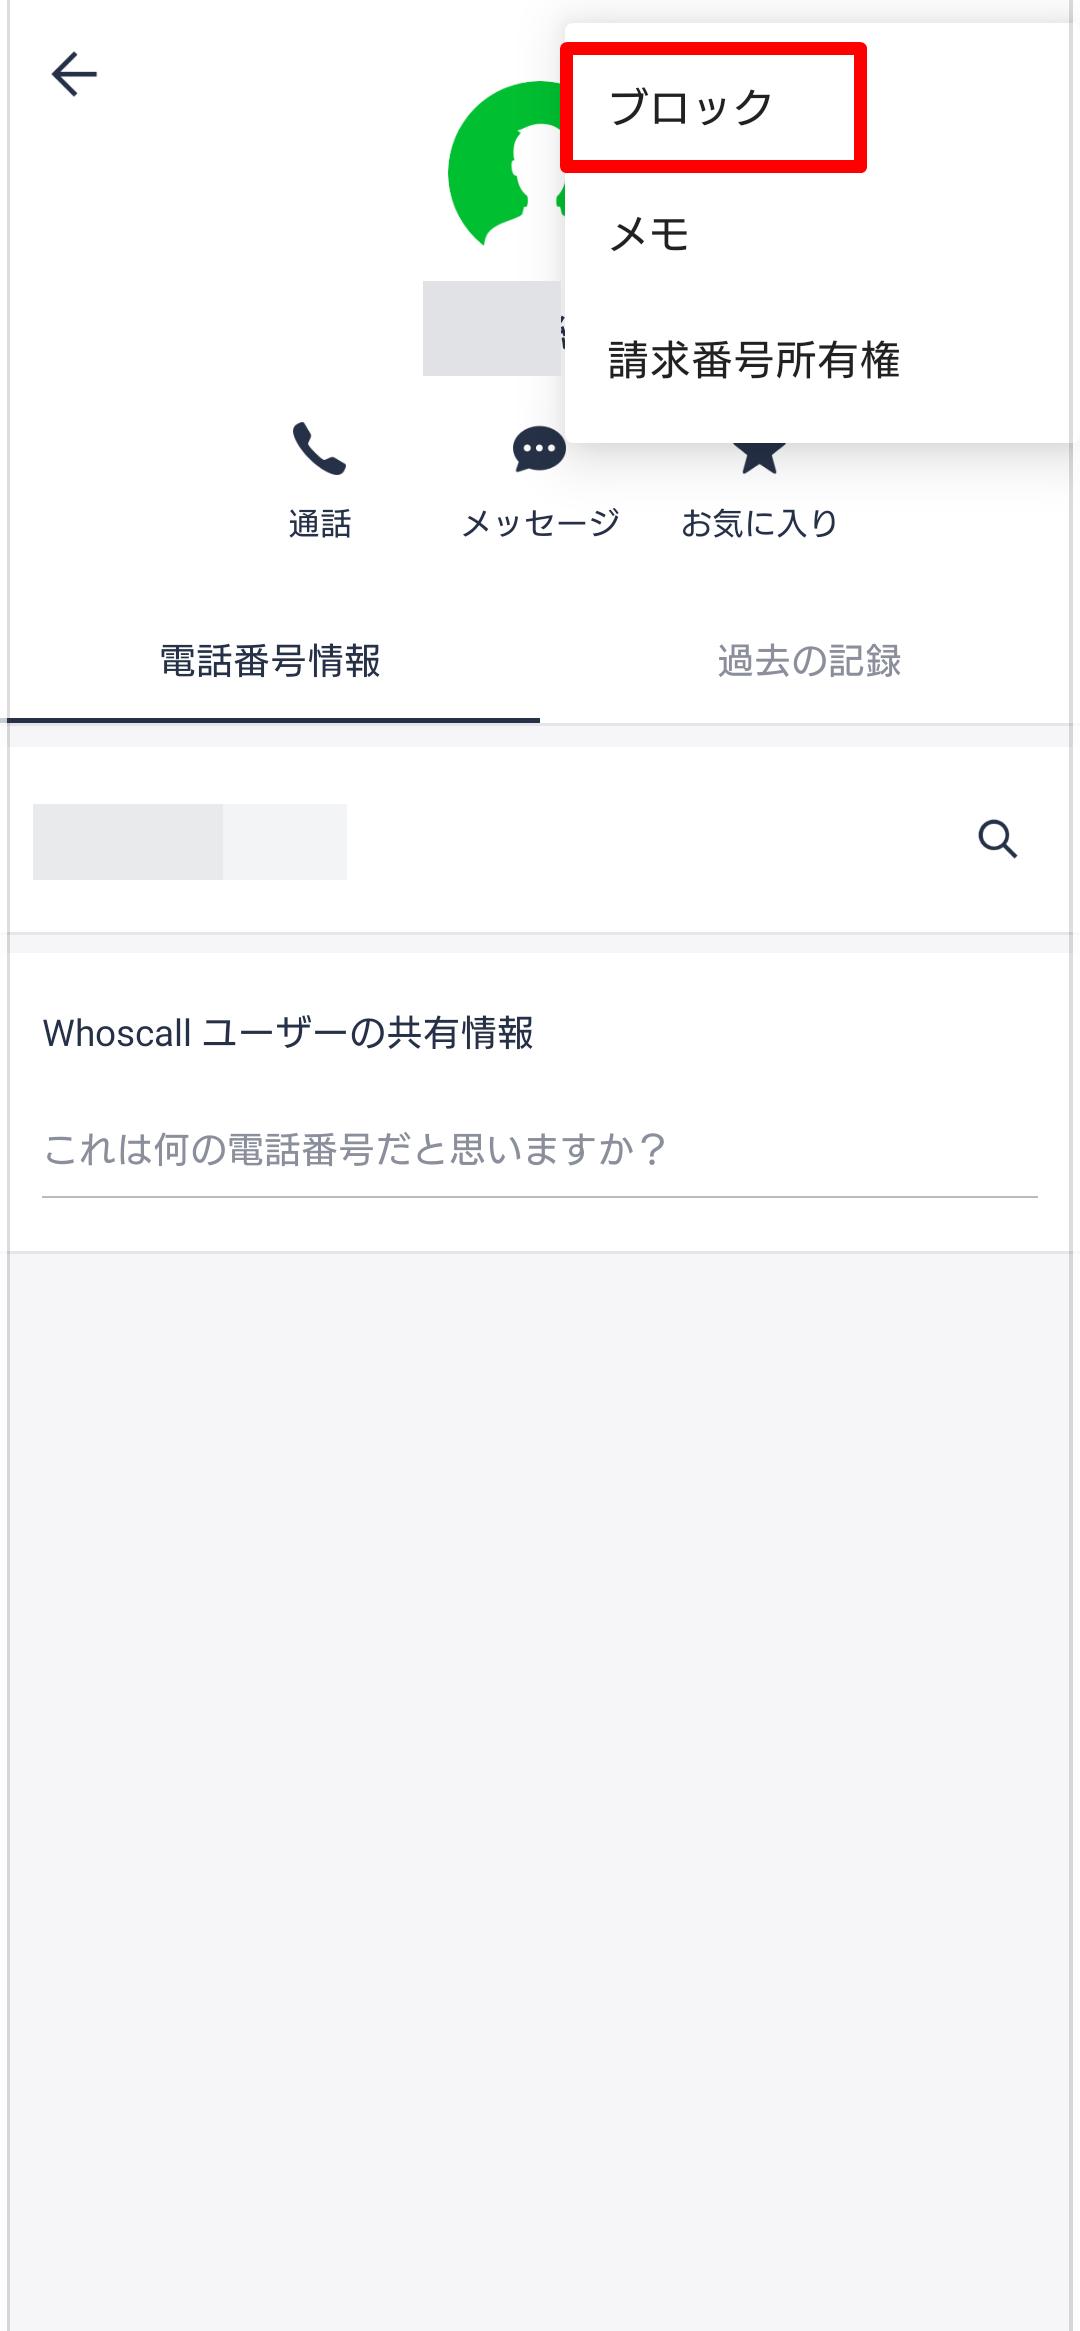 Whoscall